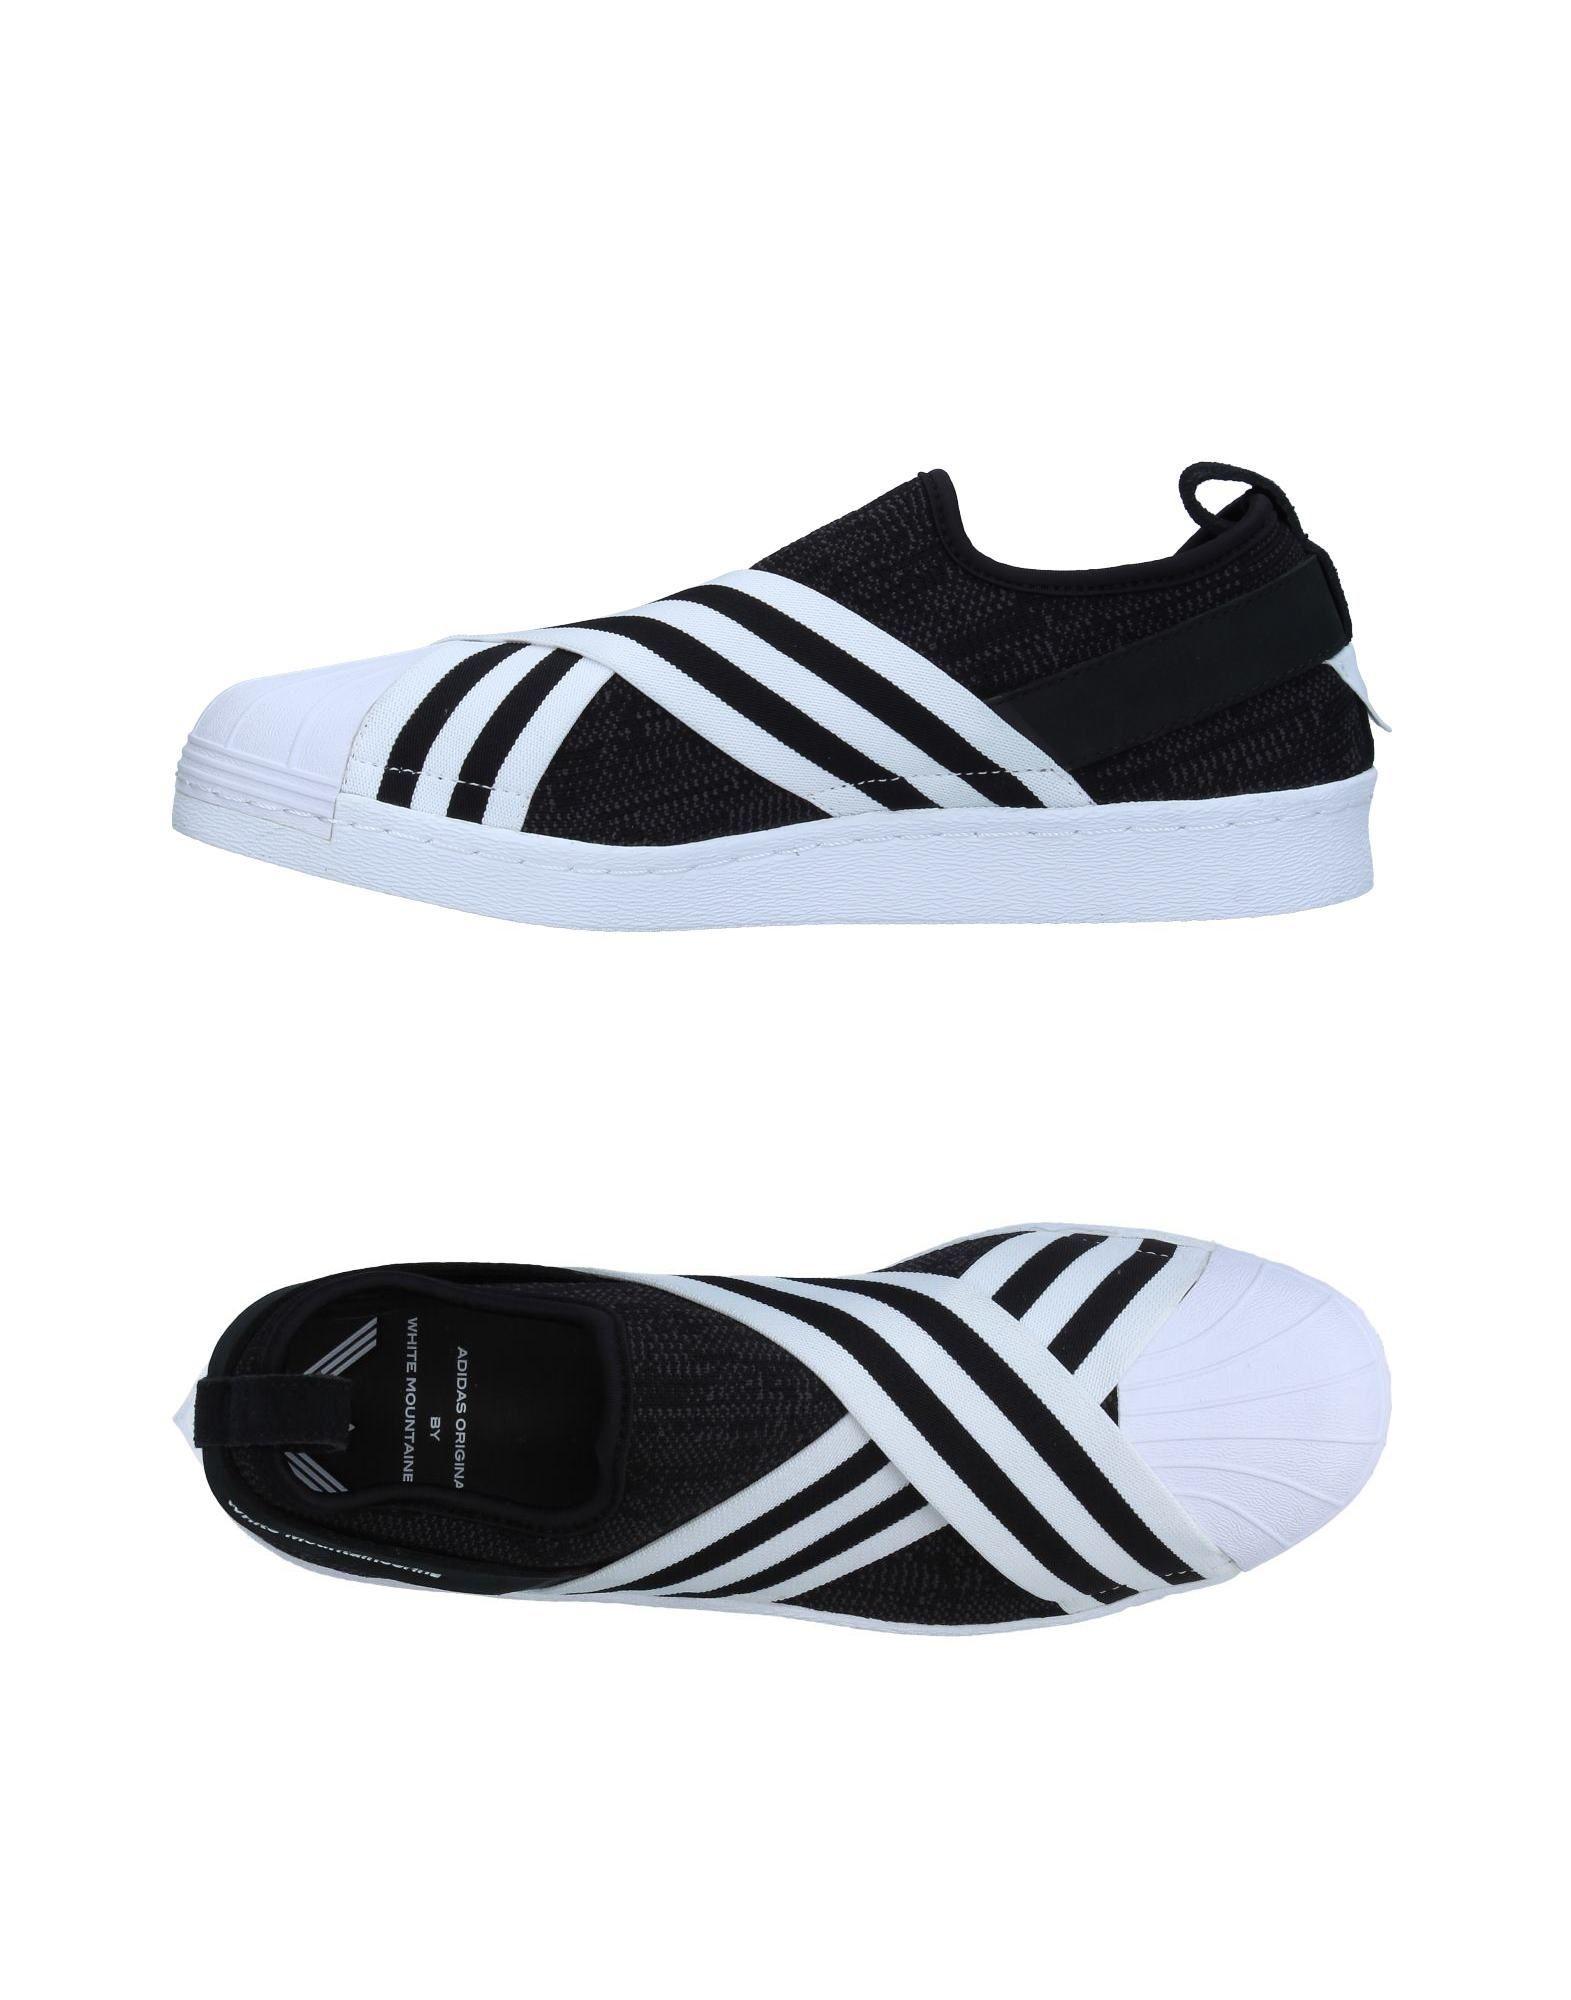 Sneakers Adidas Originals By White Mountaineering Uomo - 11335809JL